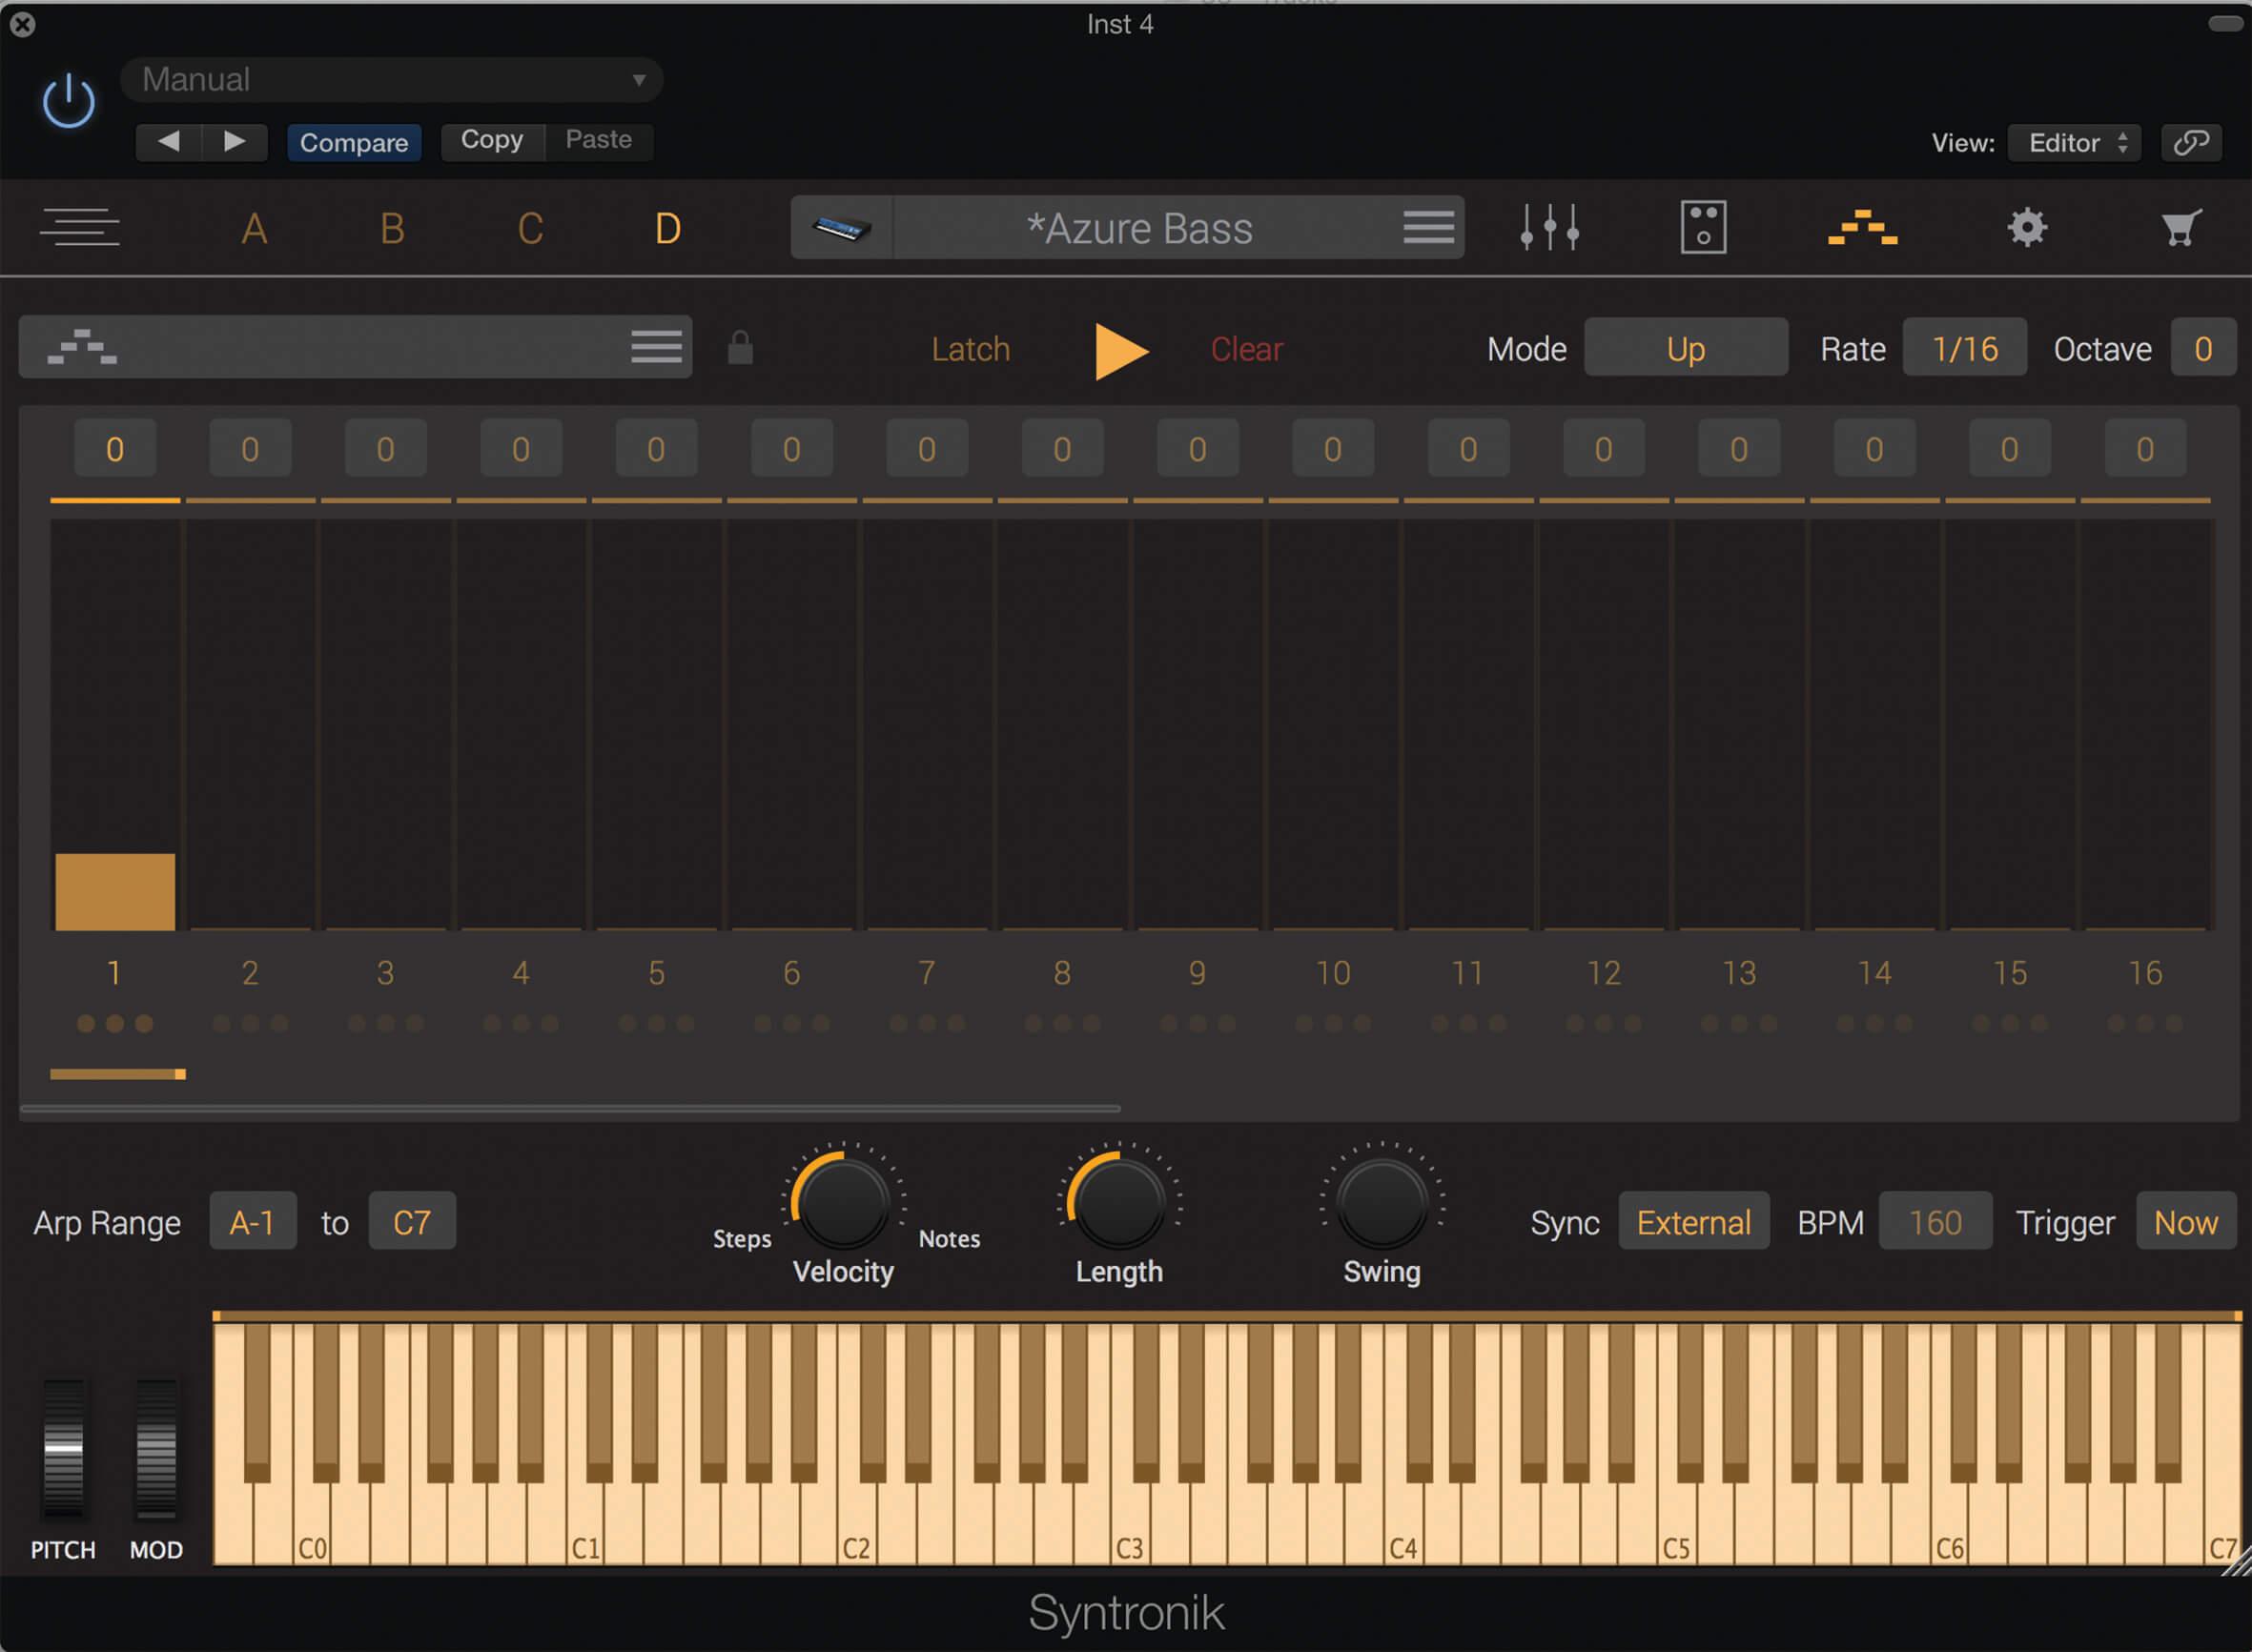 IK Multimedia Syntronik - Going Beyond A Vintage Sound